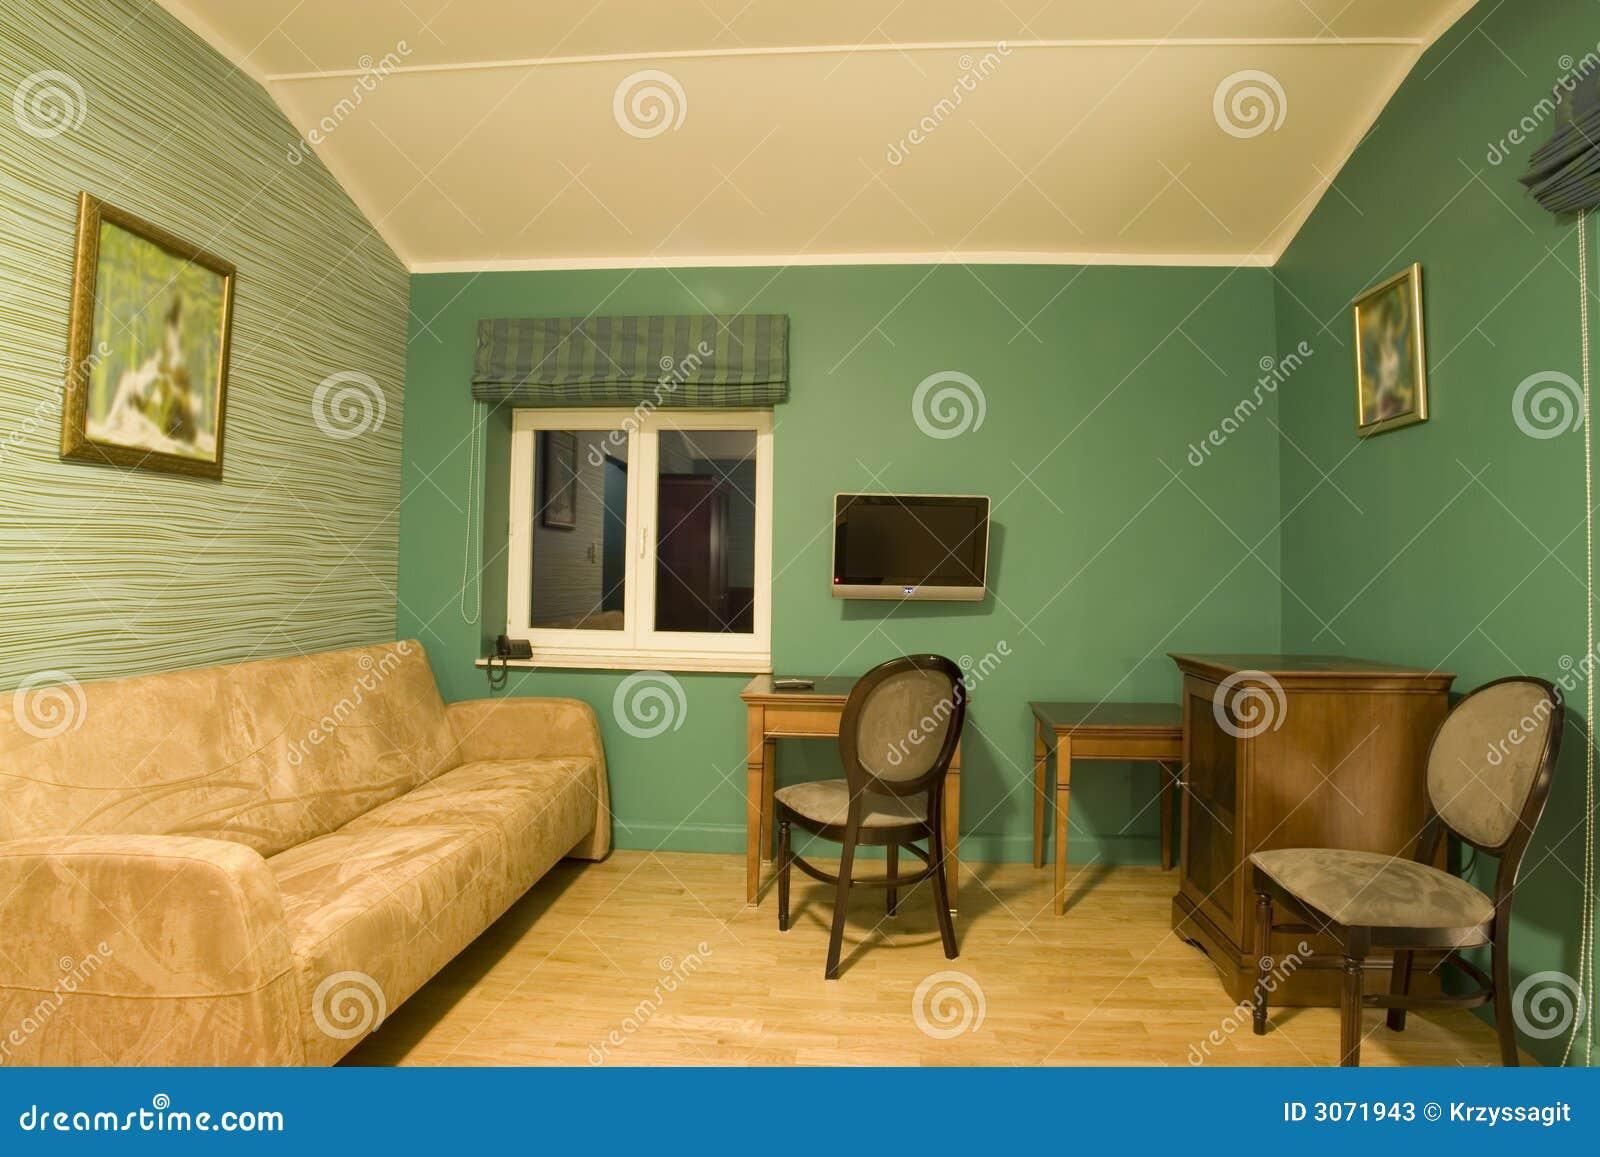 Sala De Estar Com Verde ~ Sala De Estar Verde Fotos de archivo  Imagen 3071943